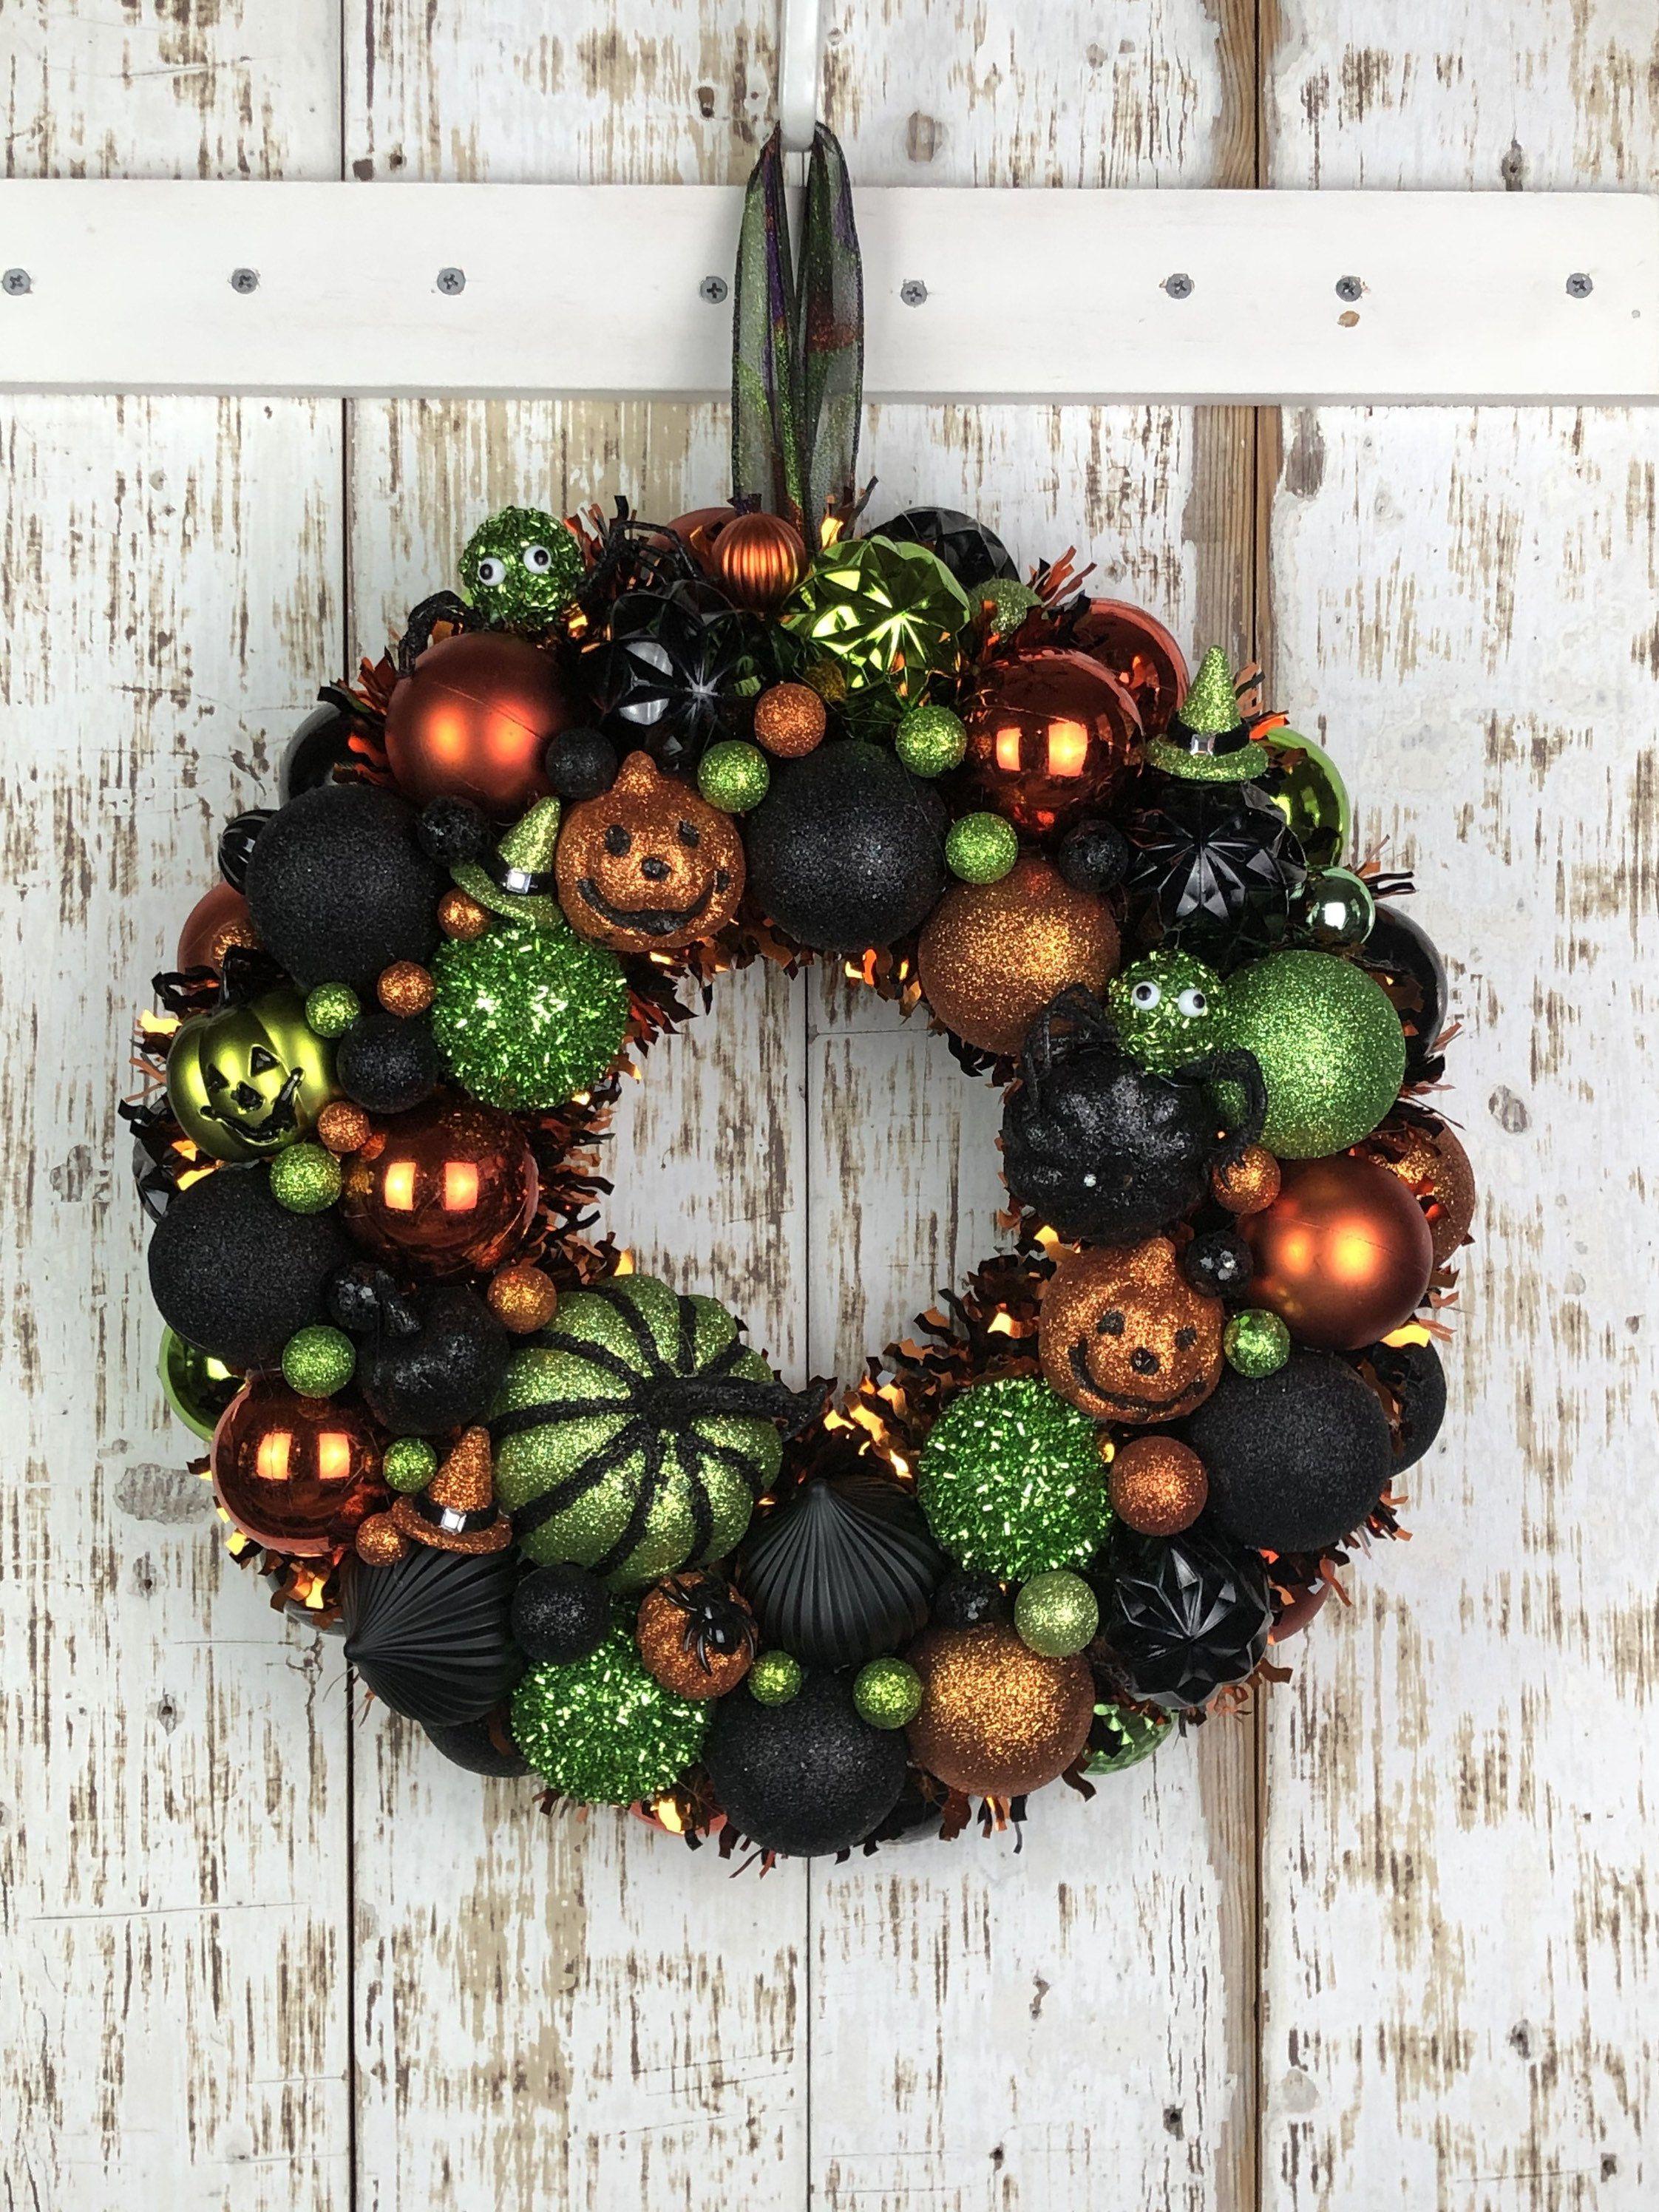 Green Orange And Black Halloween Wreath Halloween Etsy Black Halloween Wreath Halloween Ornament Wreath Diy Halloween Wreath